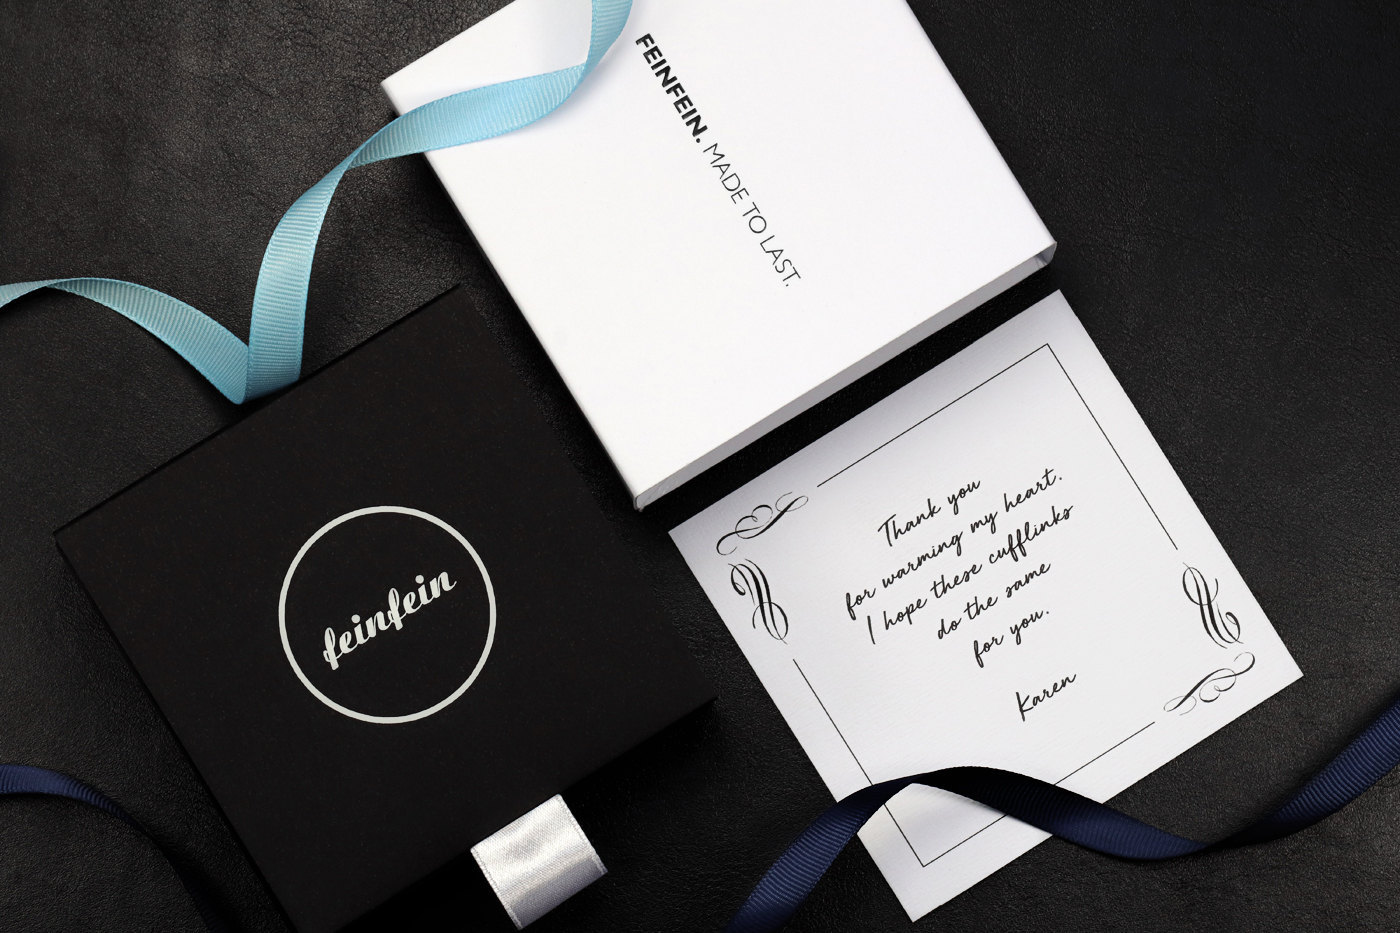 Poker Custom Collar Stays sterling silver Monogram Collar stiffeners Groom gift from bride